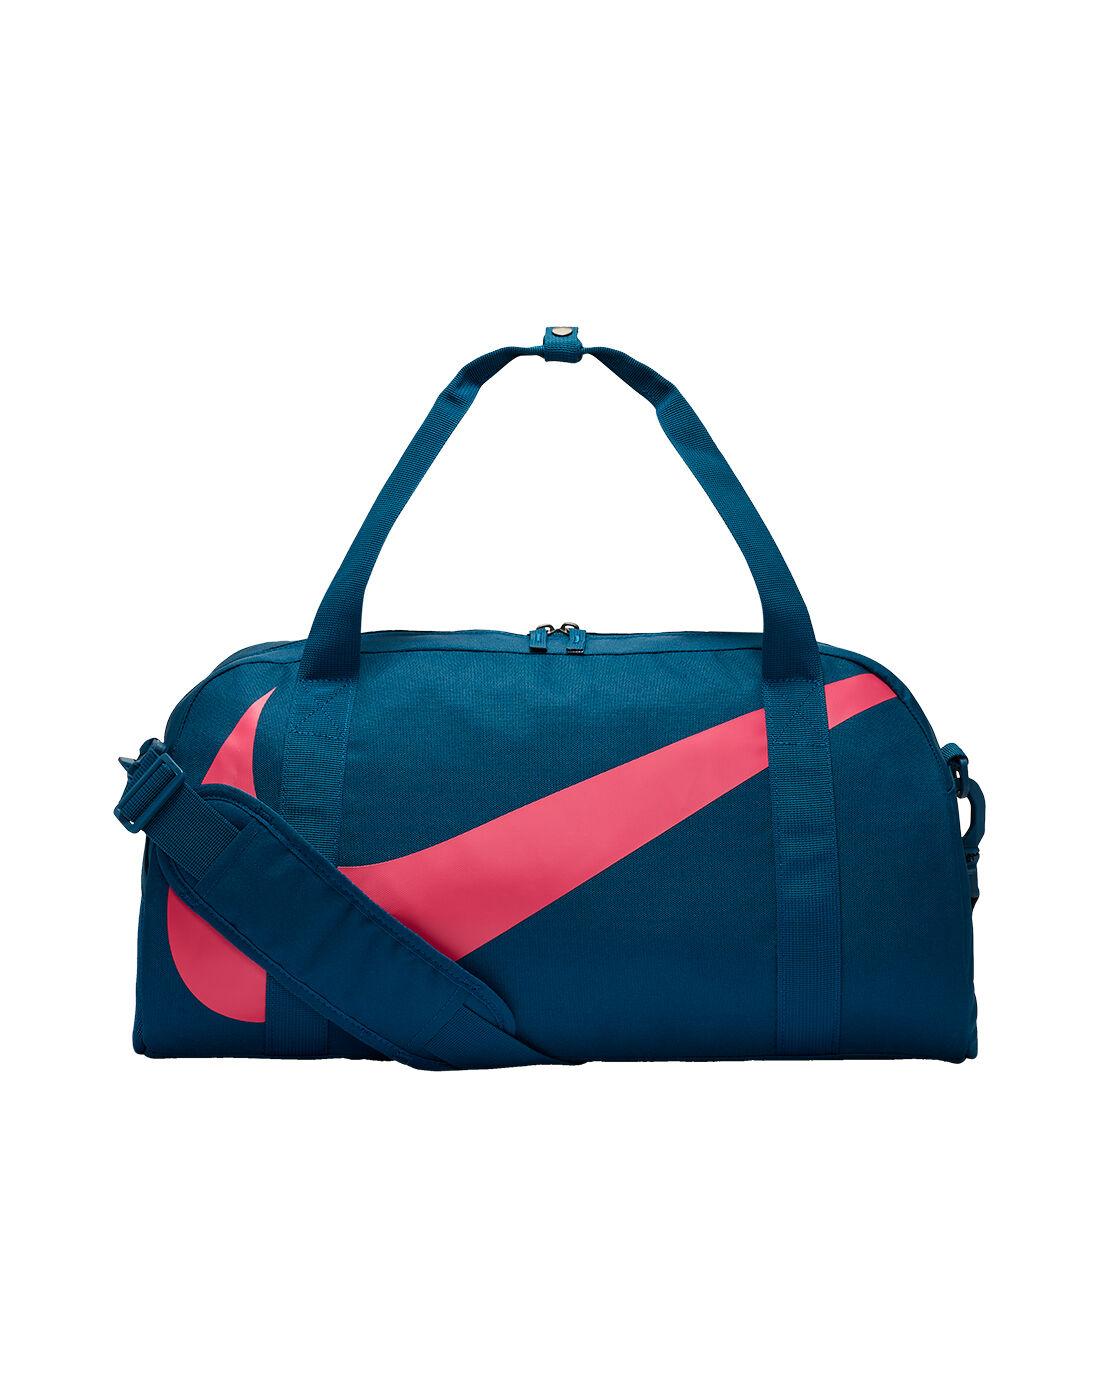 Lavenderport Tops Women Gym Bags